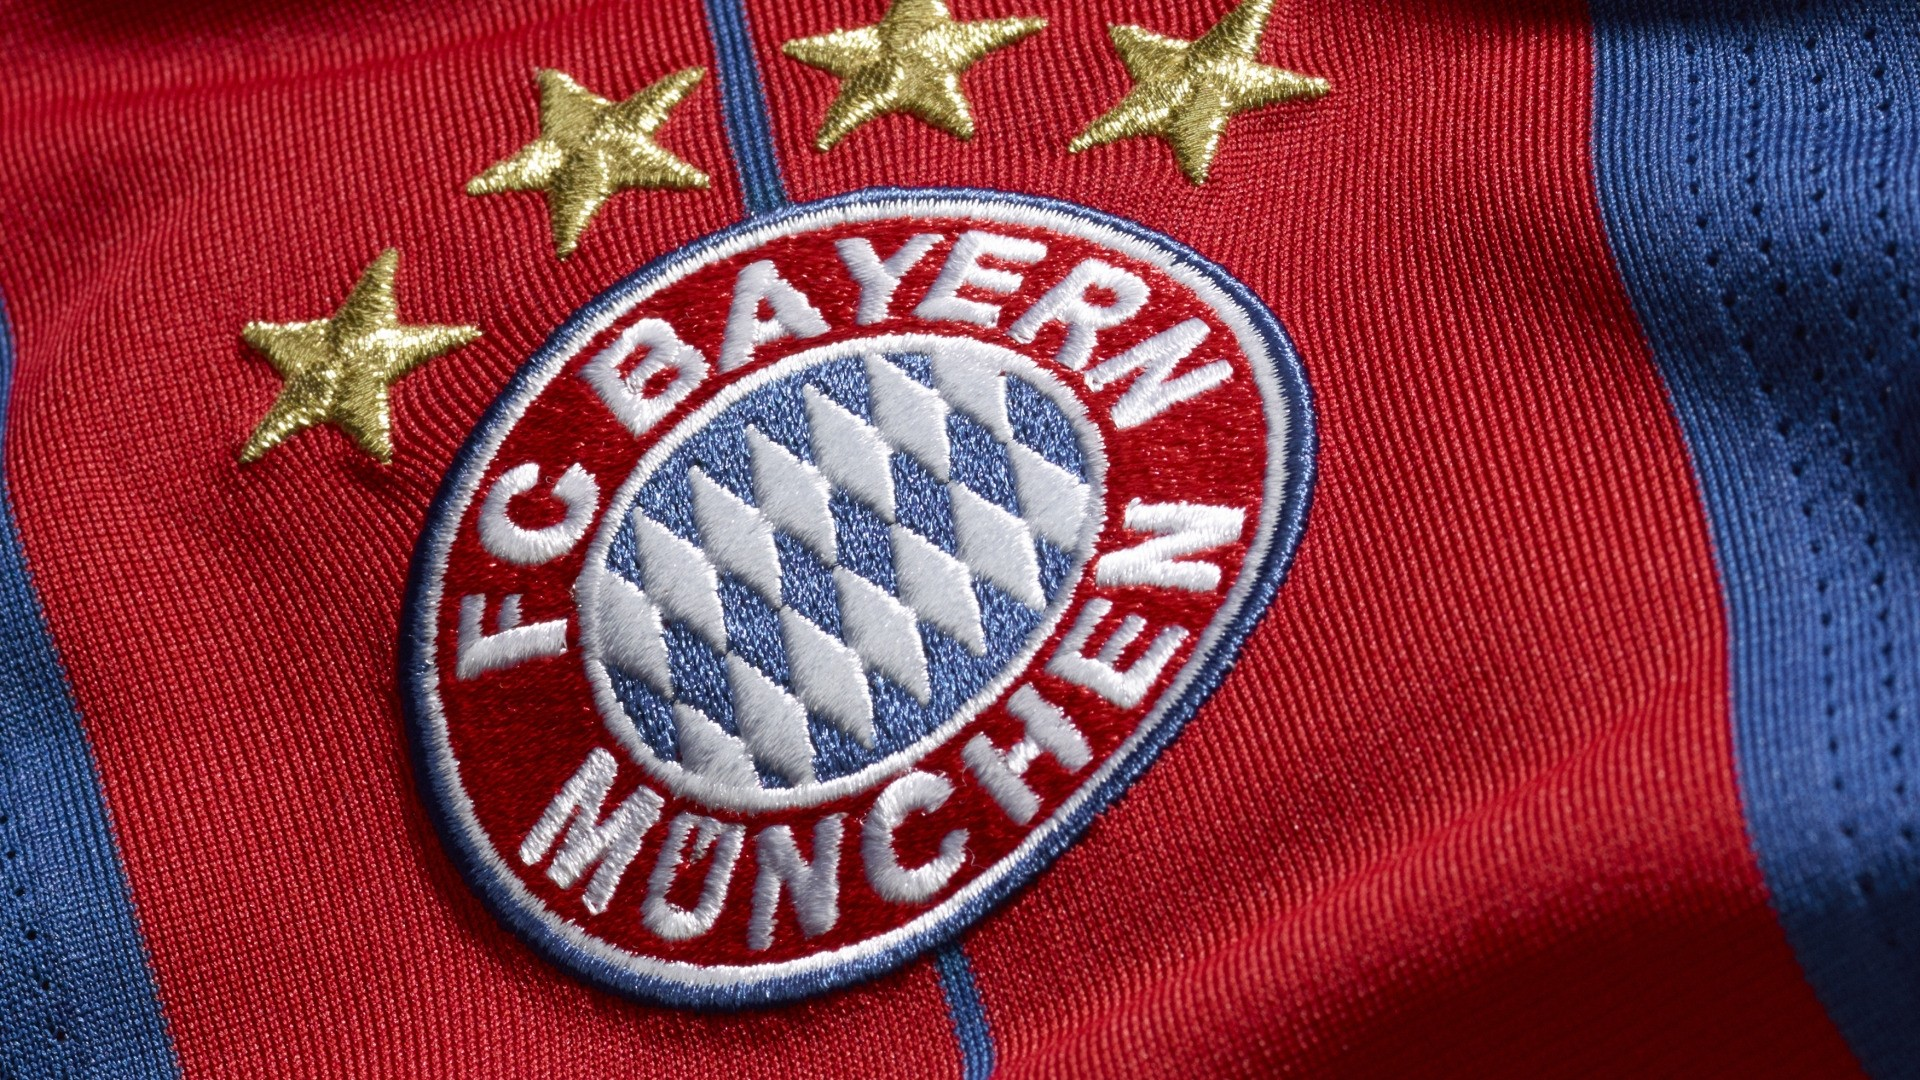 Bayern Munich wallpaper theme